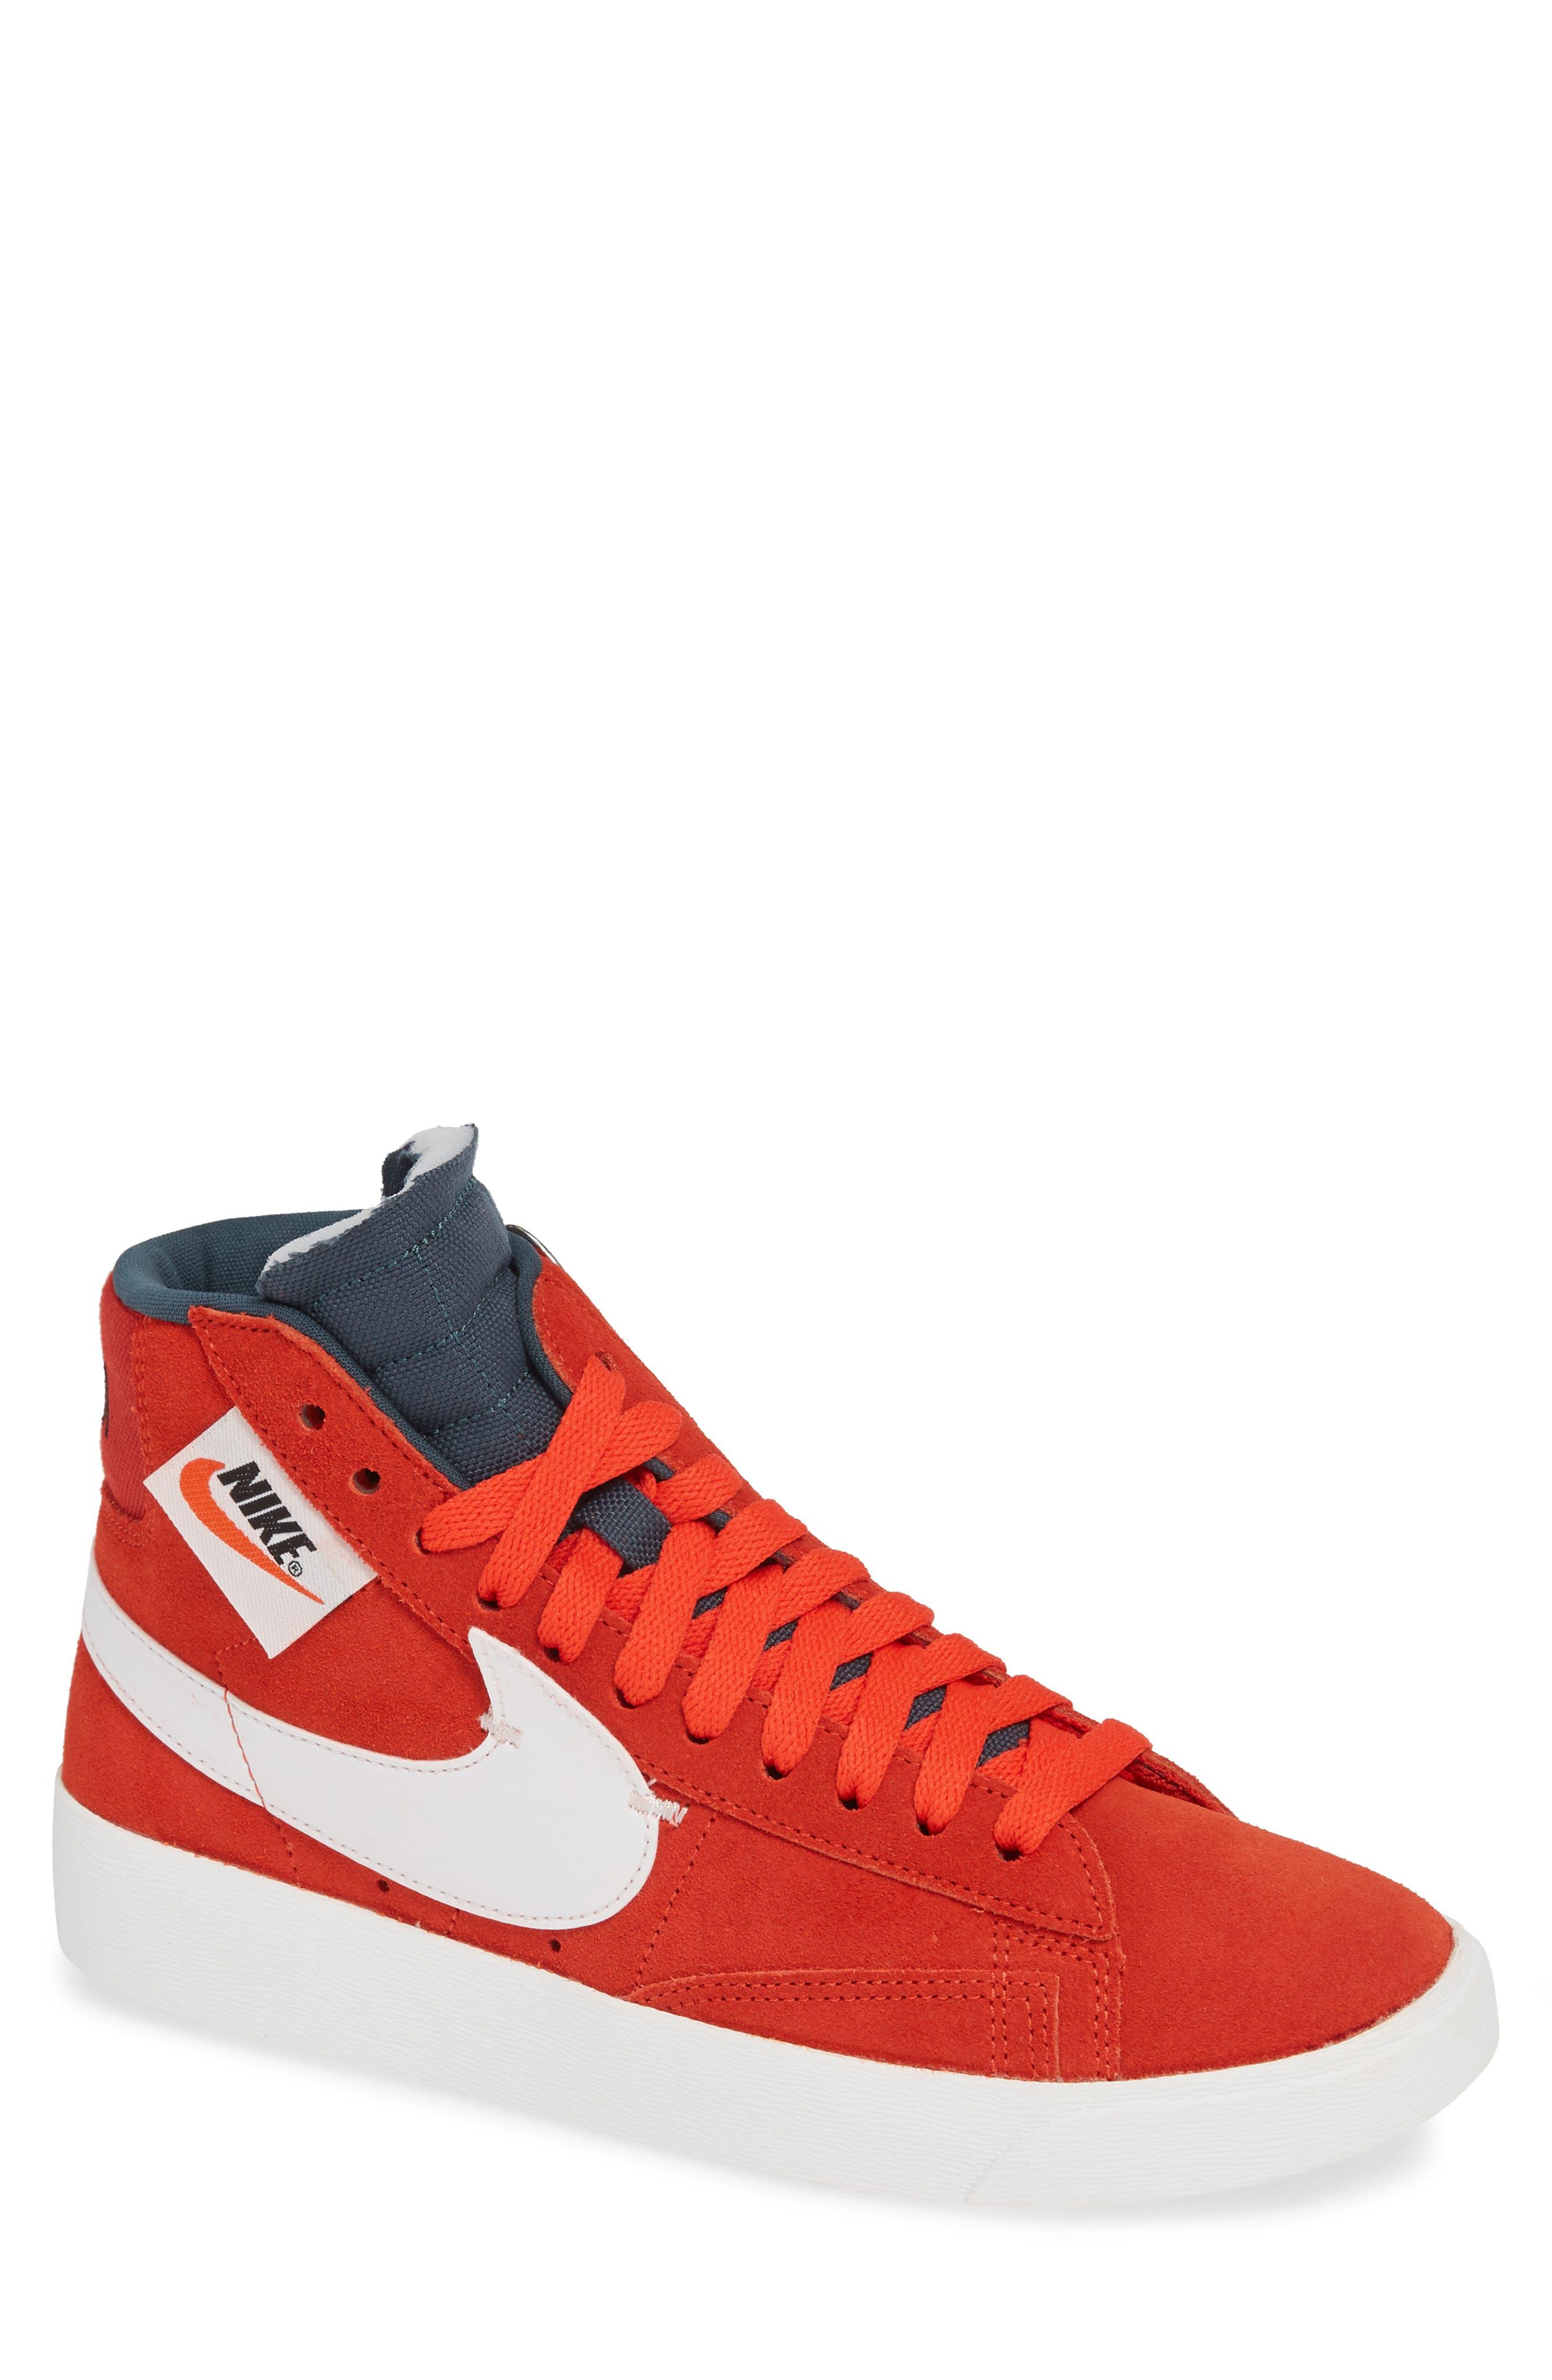 NIKE, Blazer Mid Rebel Sneaker, Main thumbnail 1, color, 601